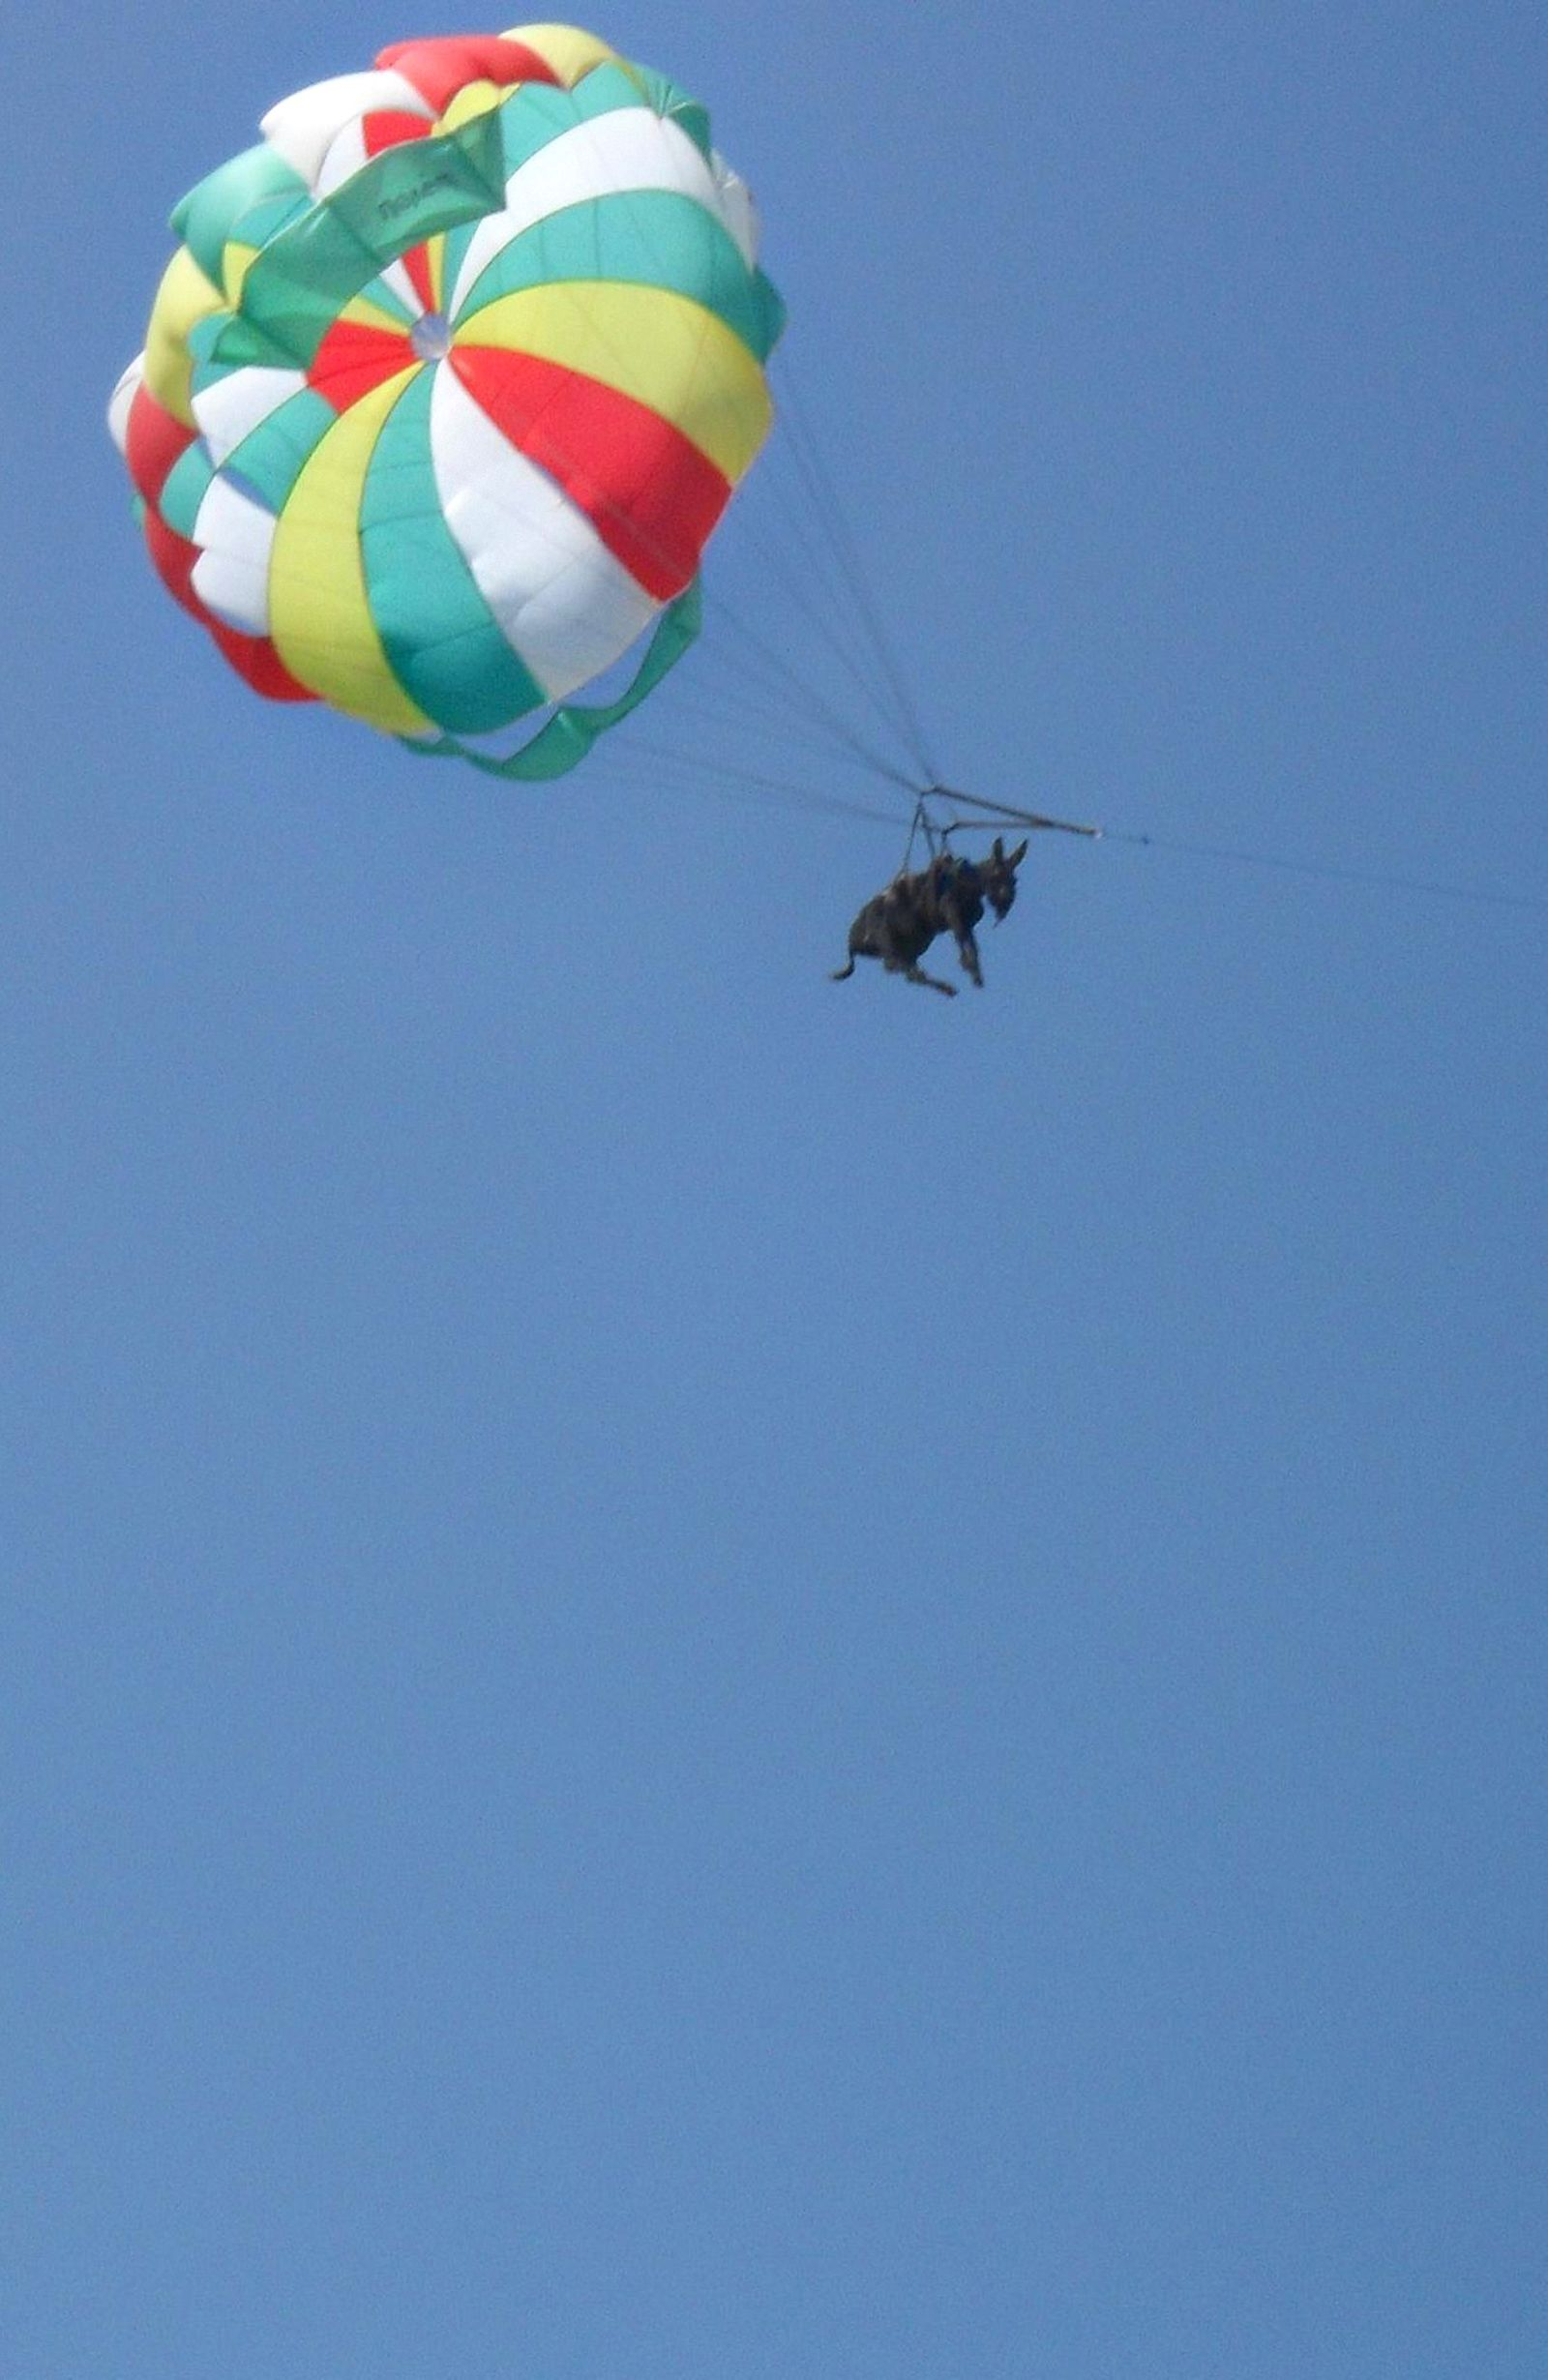 Fliegender Esel / Fallschirm